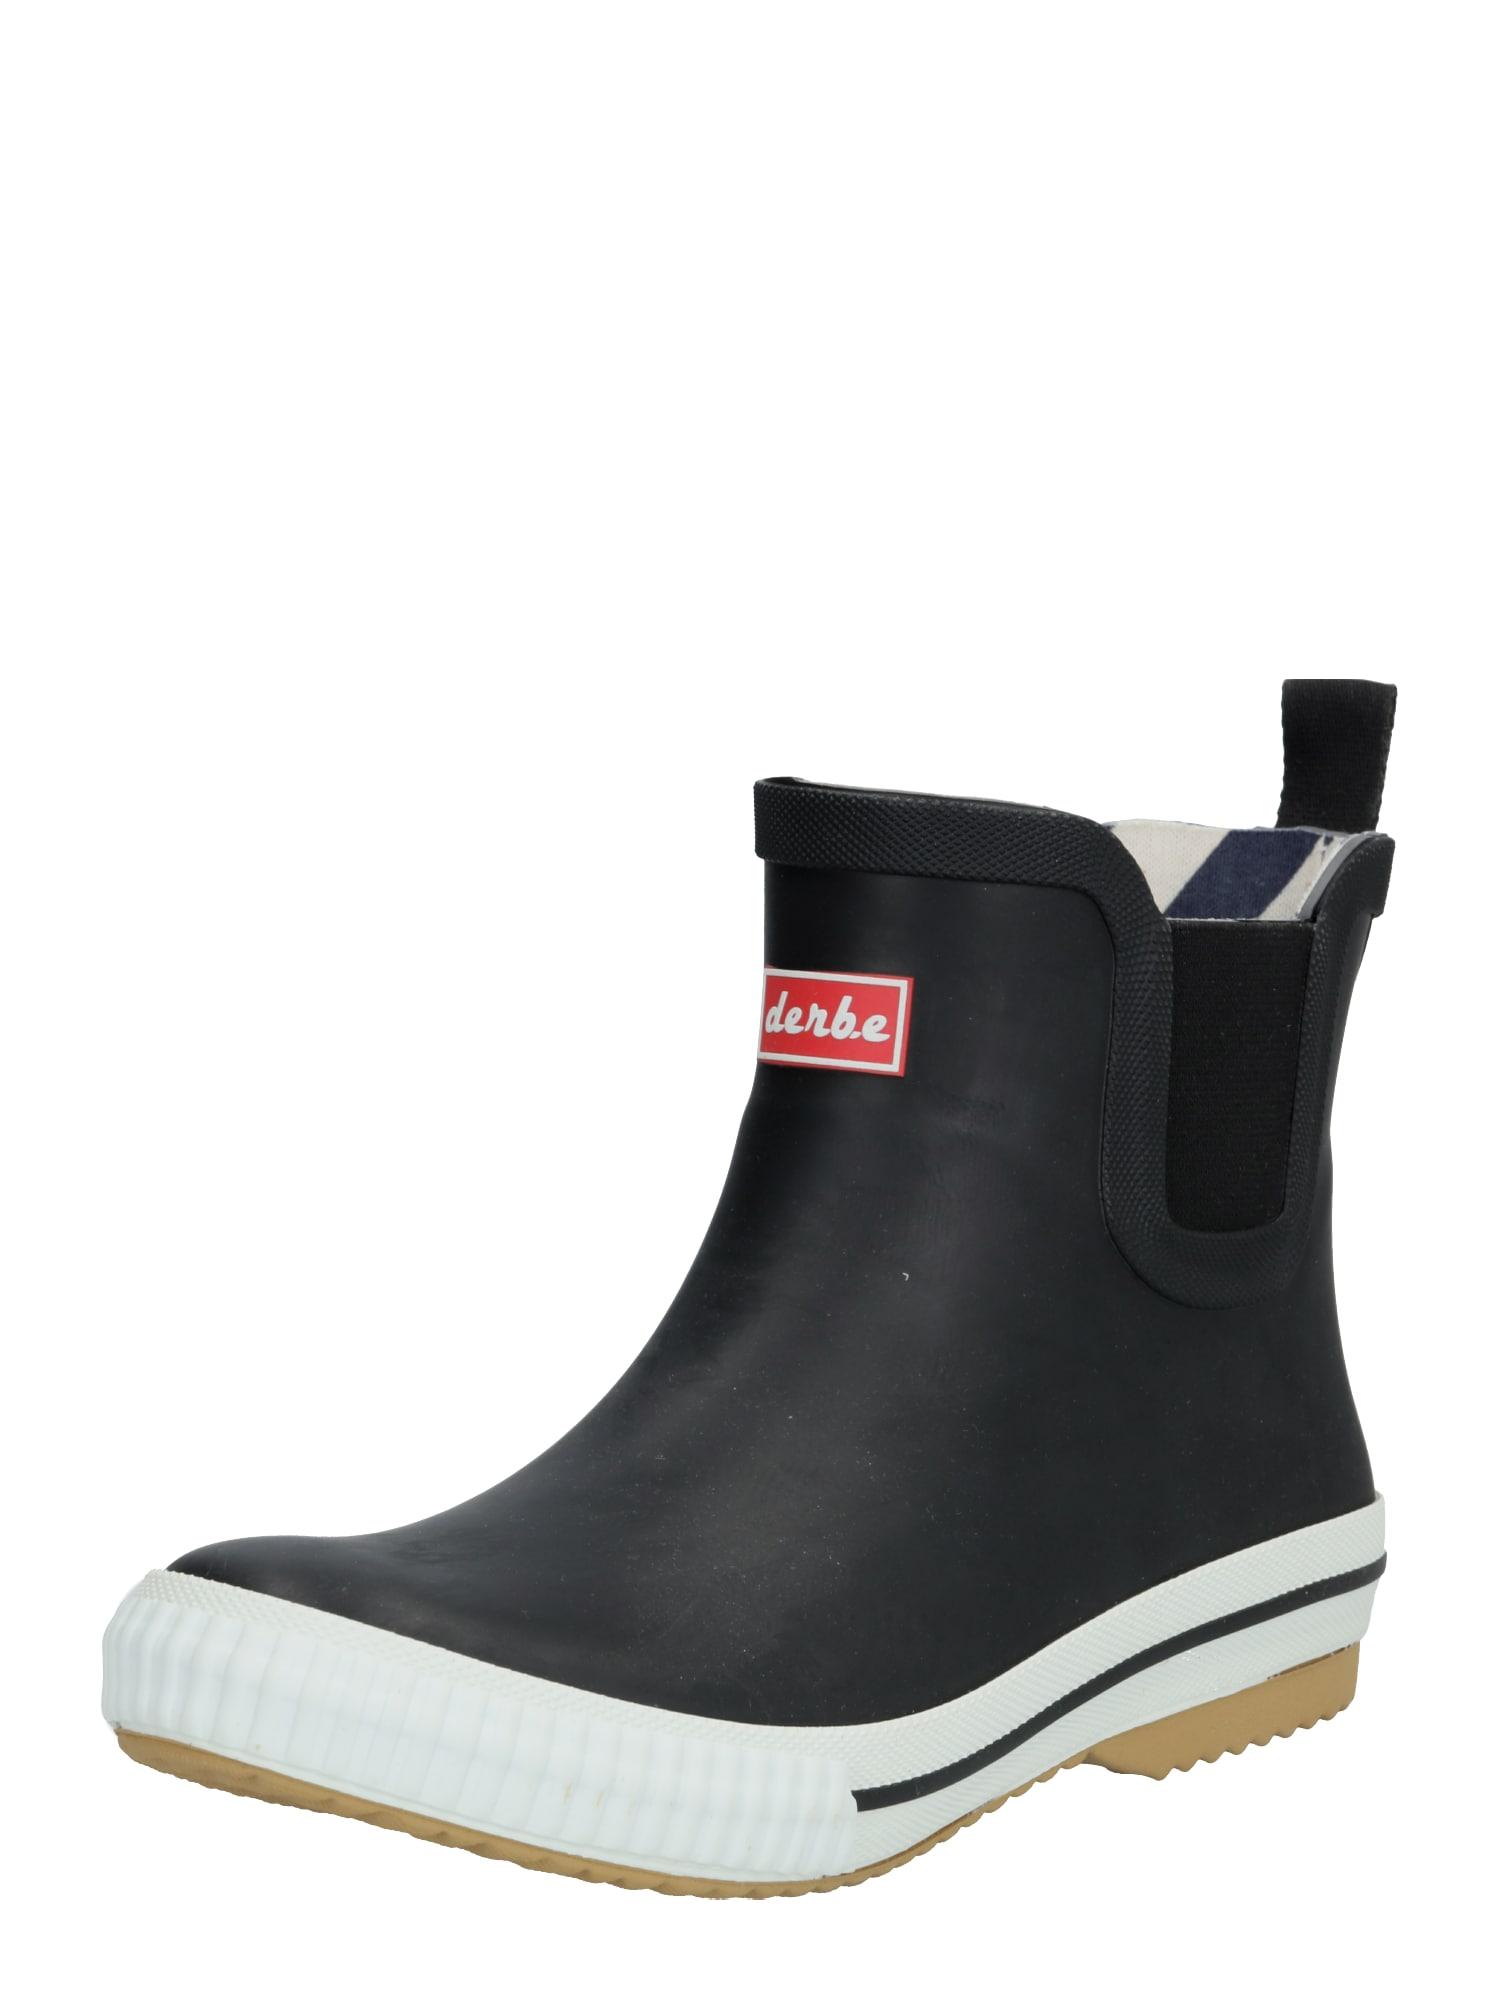 Derbe Guminiai batai 'Wattpuuschen' juoda